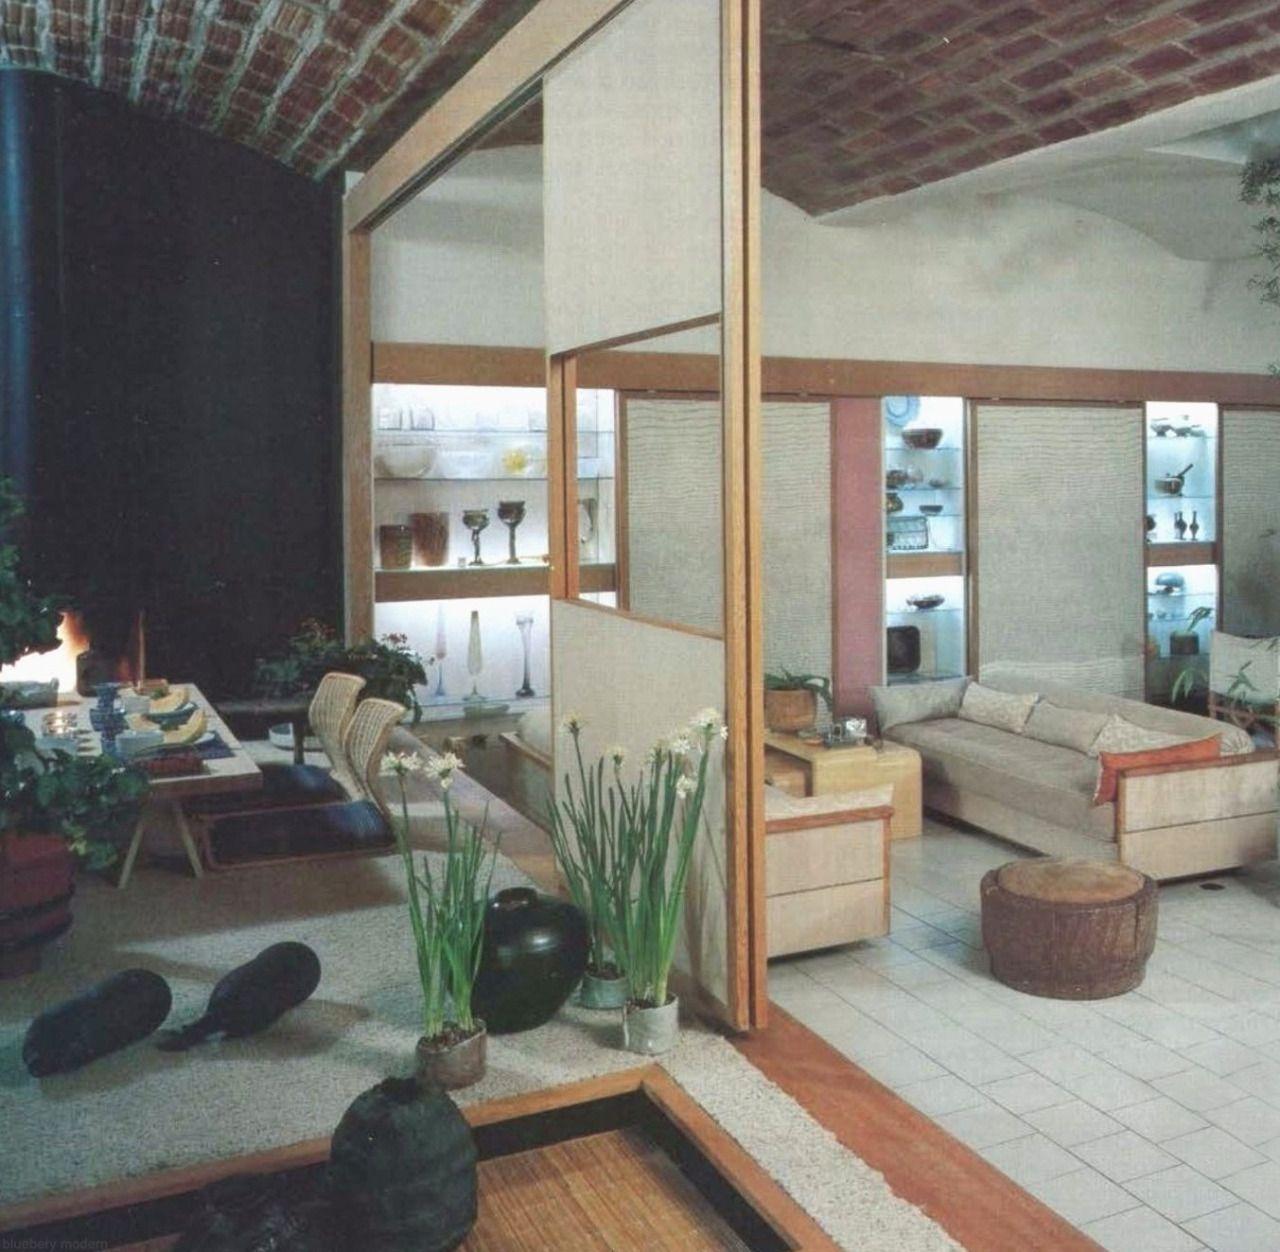 jack lenor larsen - nyc apartment 1980s   interiors   Pinterest ...